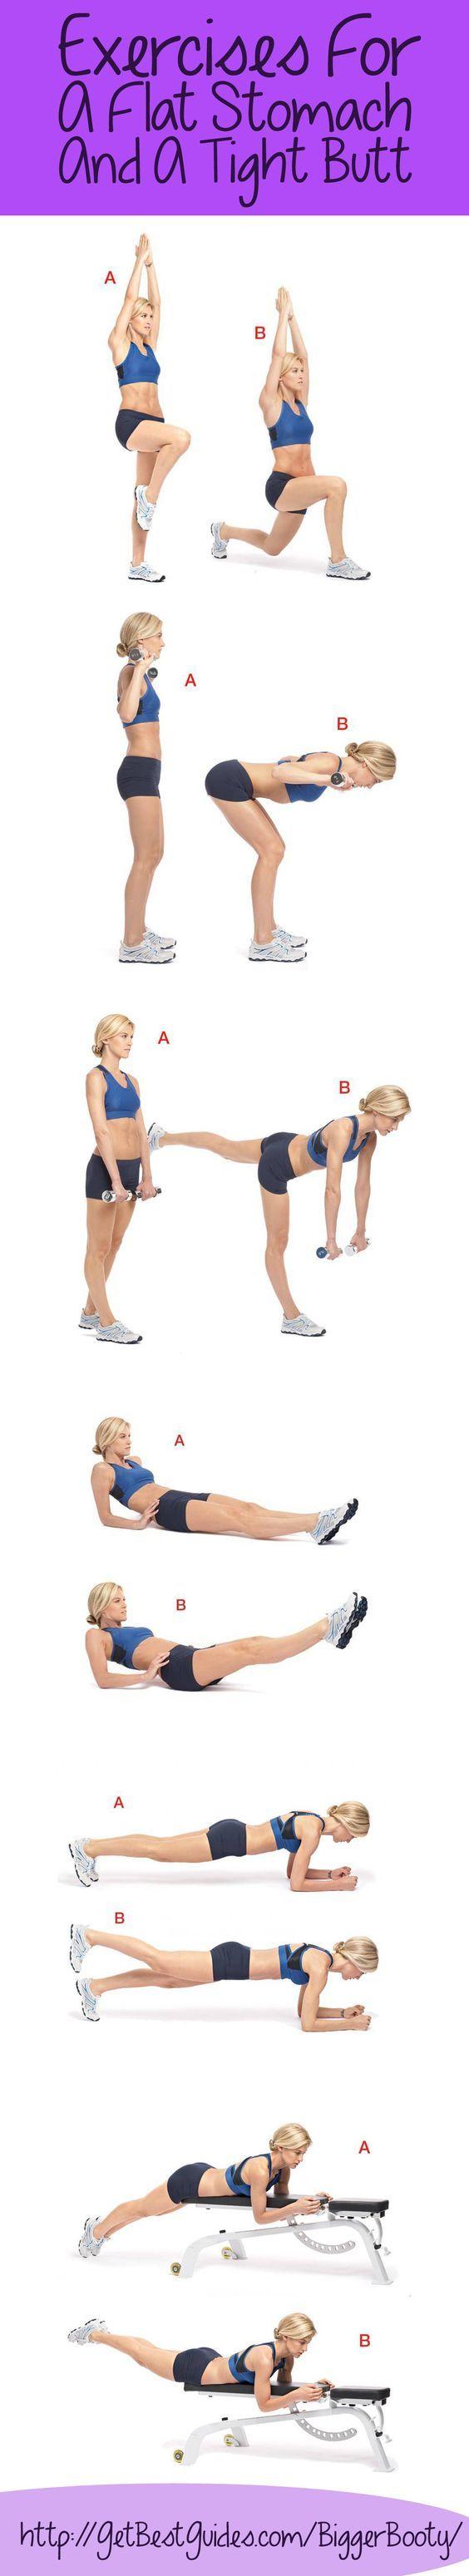 Postnatal Ab Workout Works transverse abdominis for diastasis recti Use 10 lbs medicine ball or weights